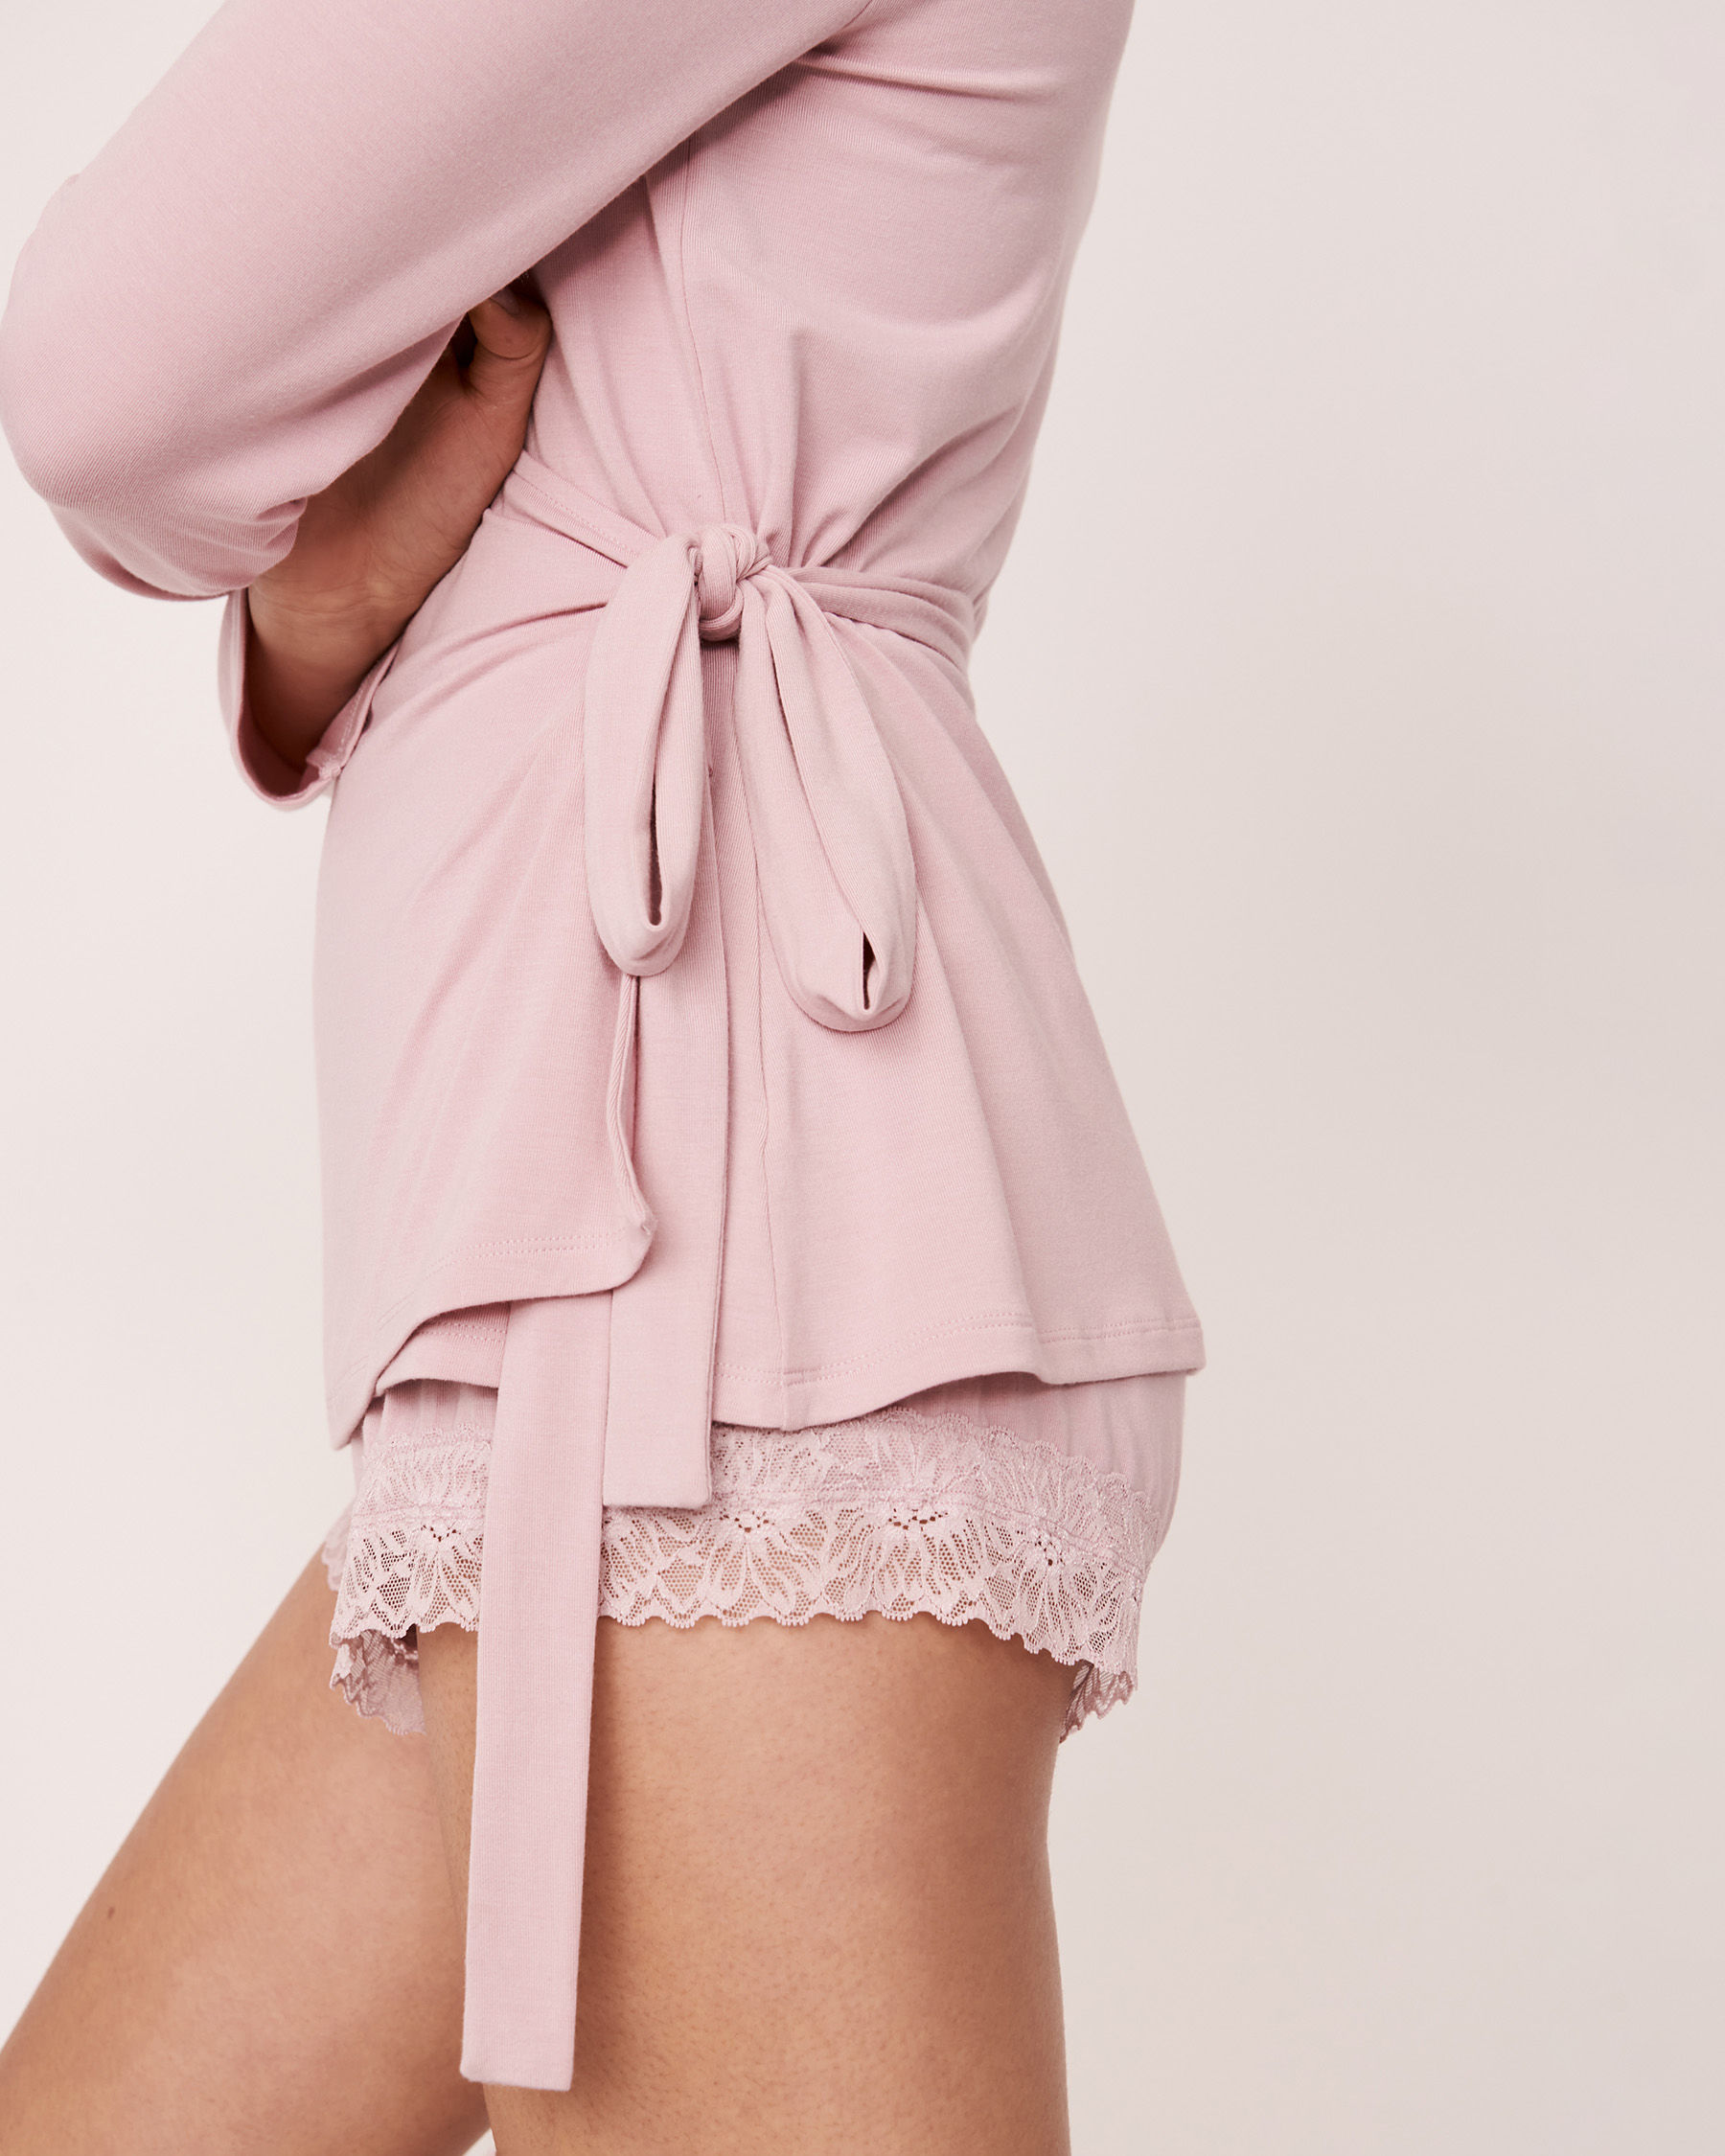 LA VIE EN ROSE Modal Wrap Over Long Sleeve Shirt Lilac 40100157 - View3